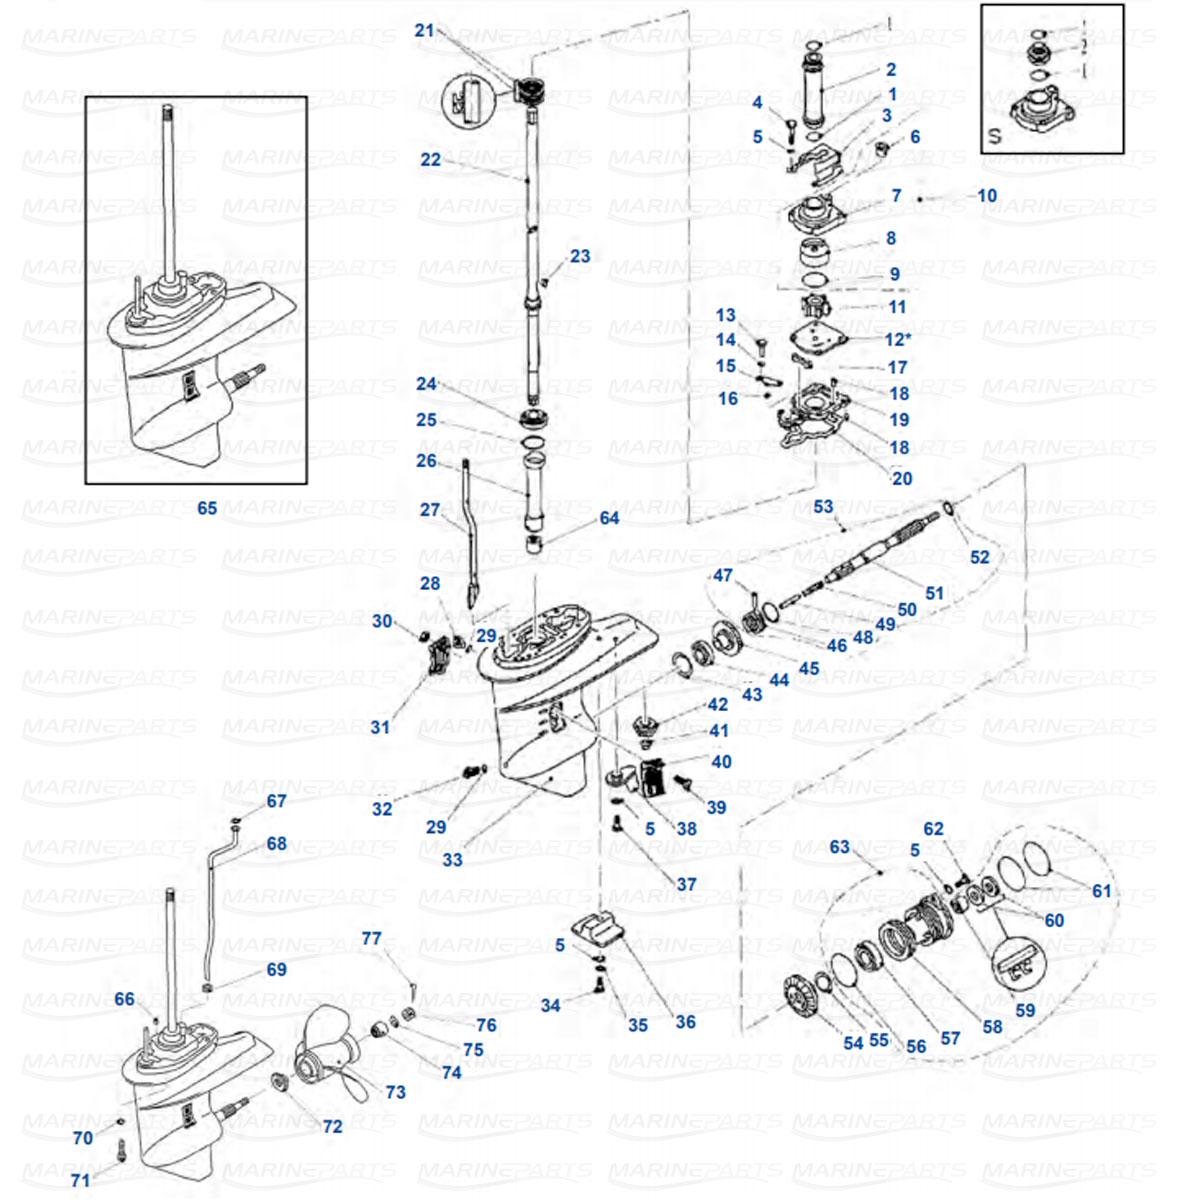 Gearcase parts Yamaha F20, F25 4-stroke